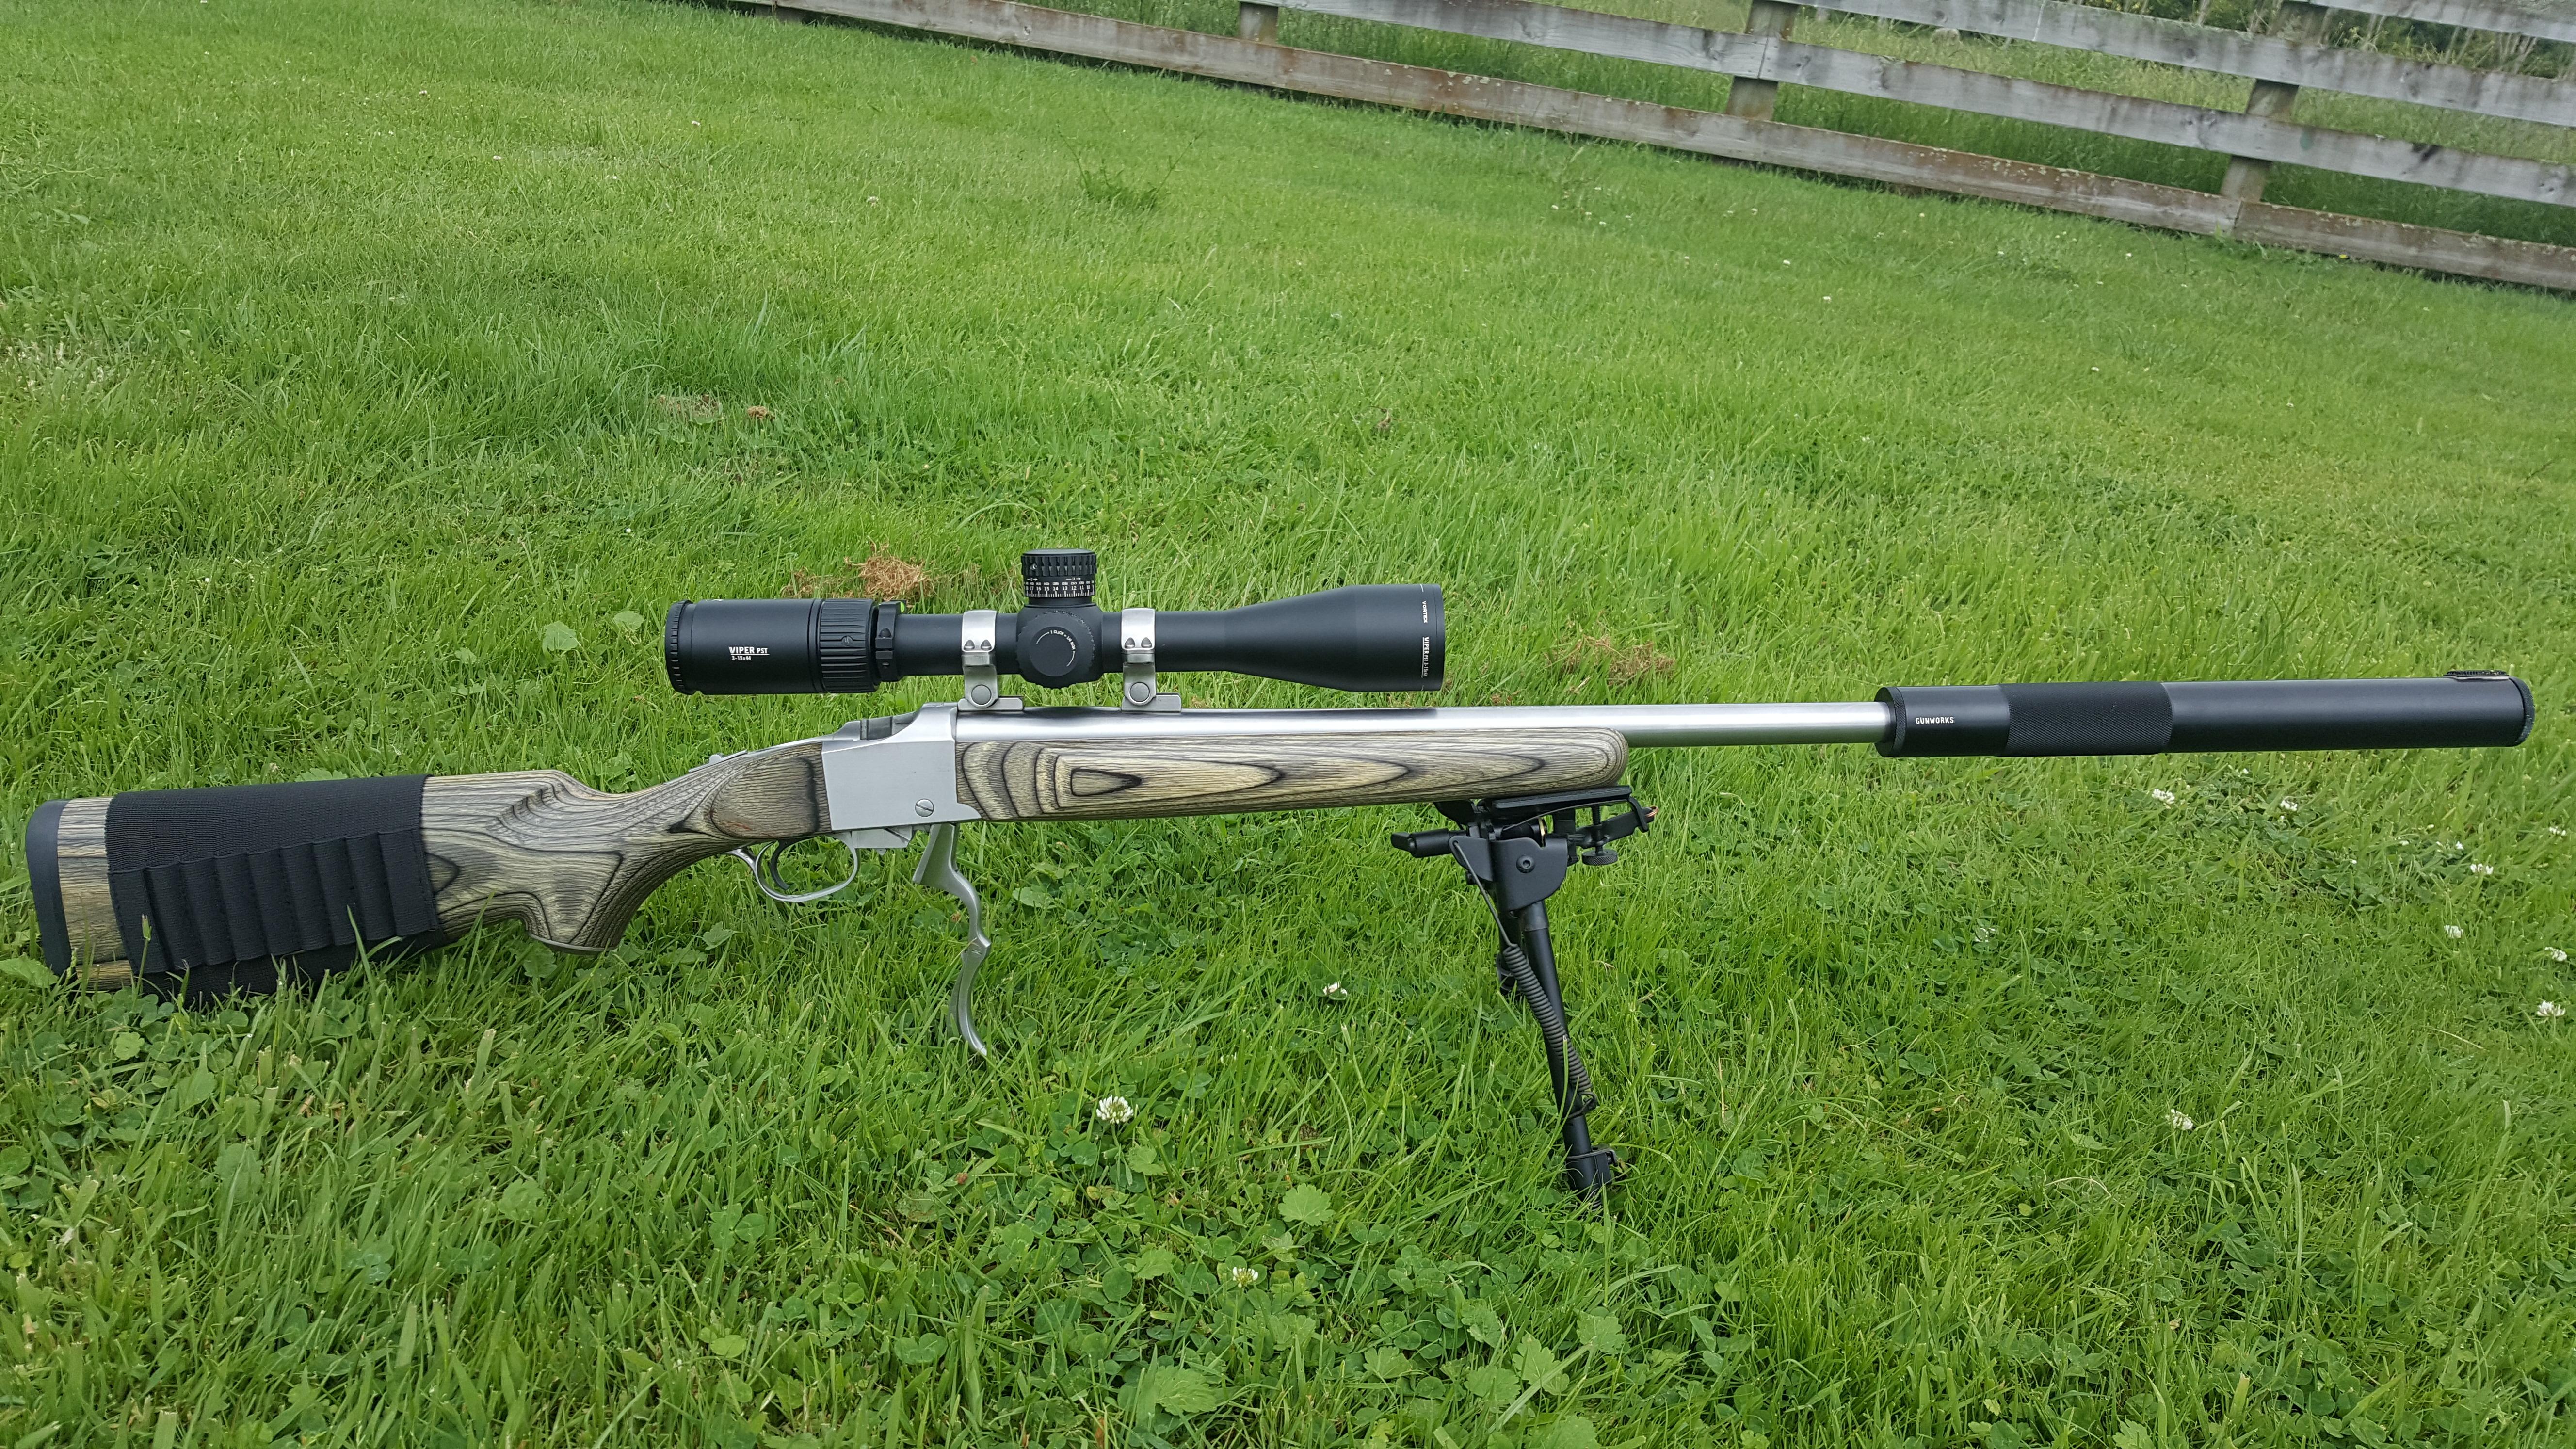 Name:  Ruger No.1 .204 SS Laminate Stock  Vortex Viper PST Gen II 3-15x44 Gunworks Suppressor 1.jpg Views: 176 Size:  7.03 MB